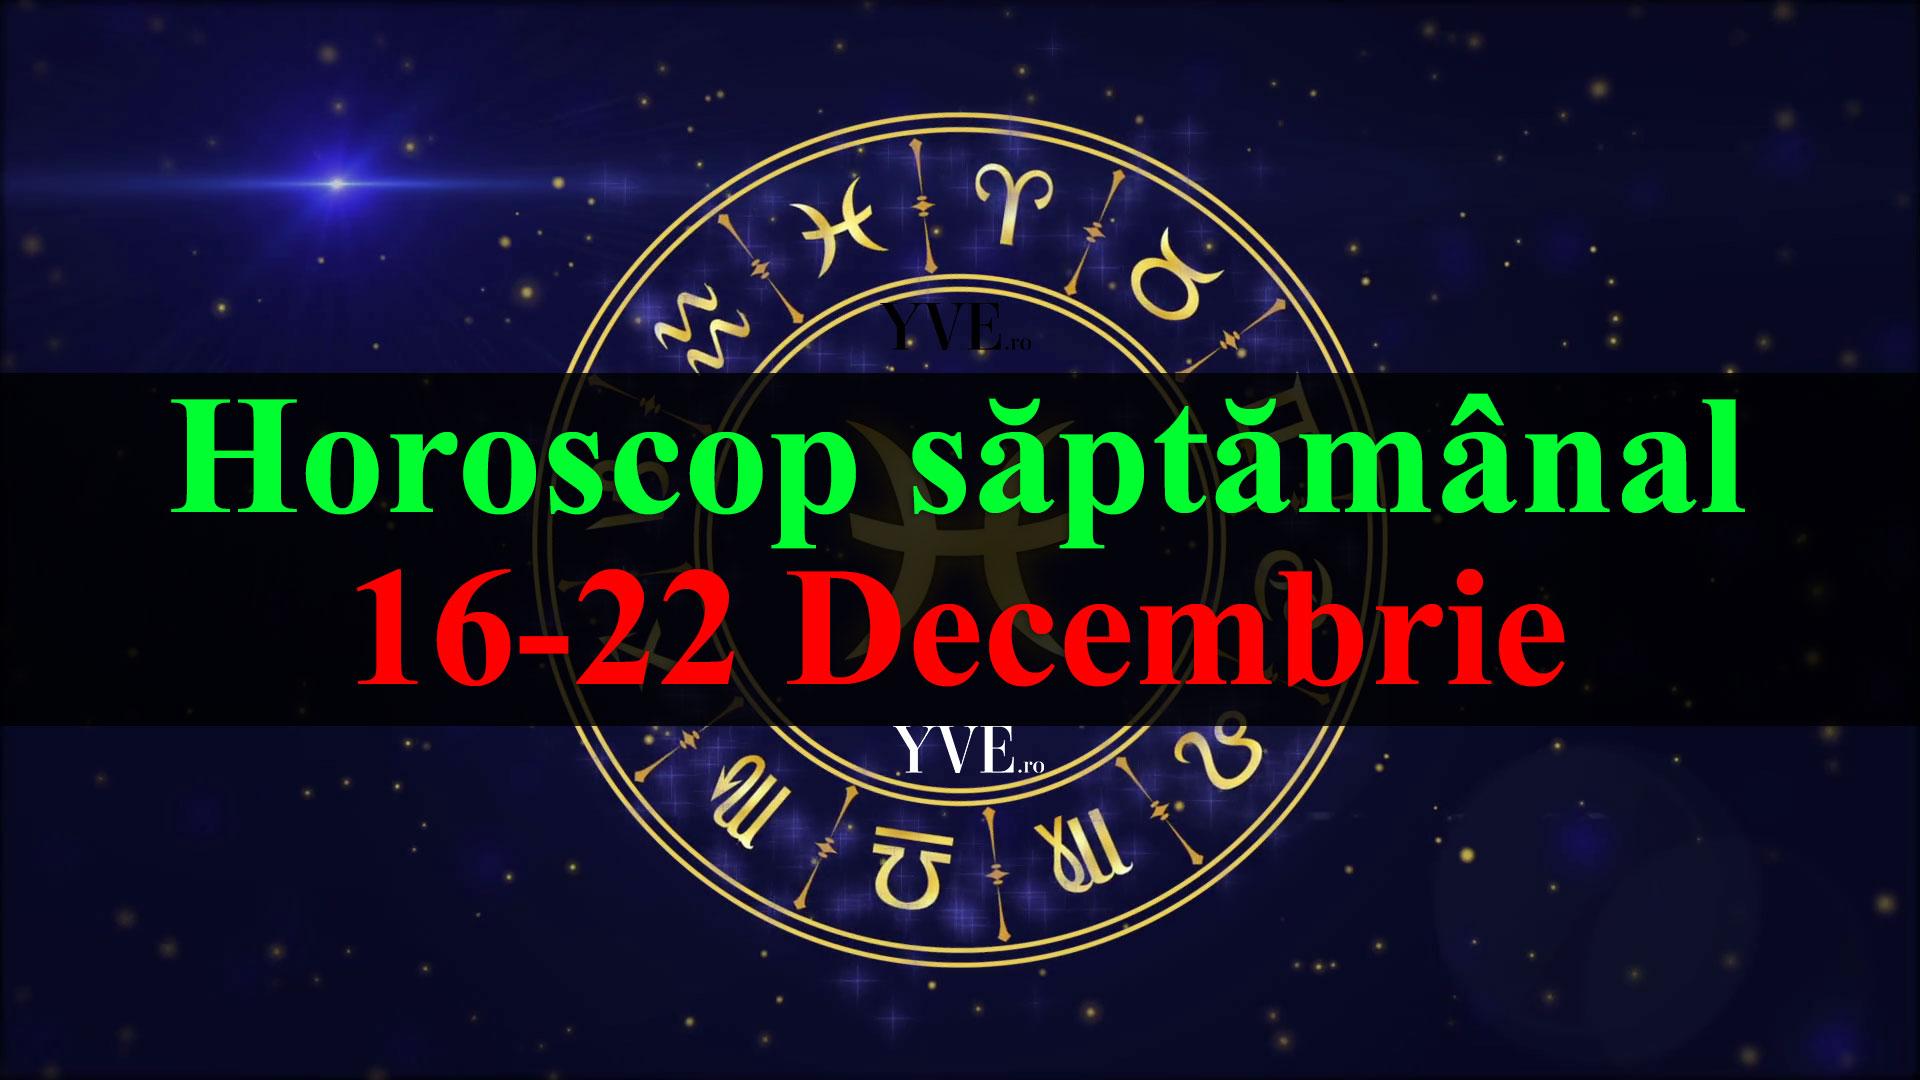 Horoscop saptamanal 16-22 Decembrie 2019